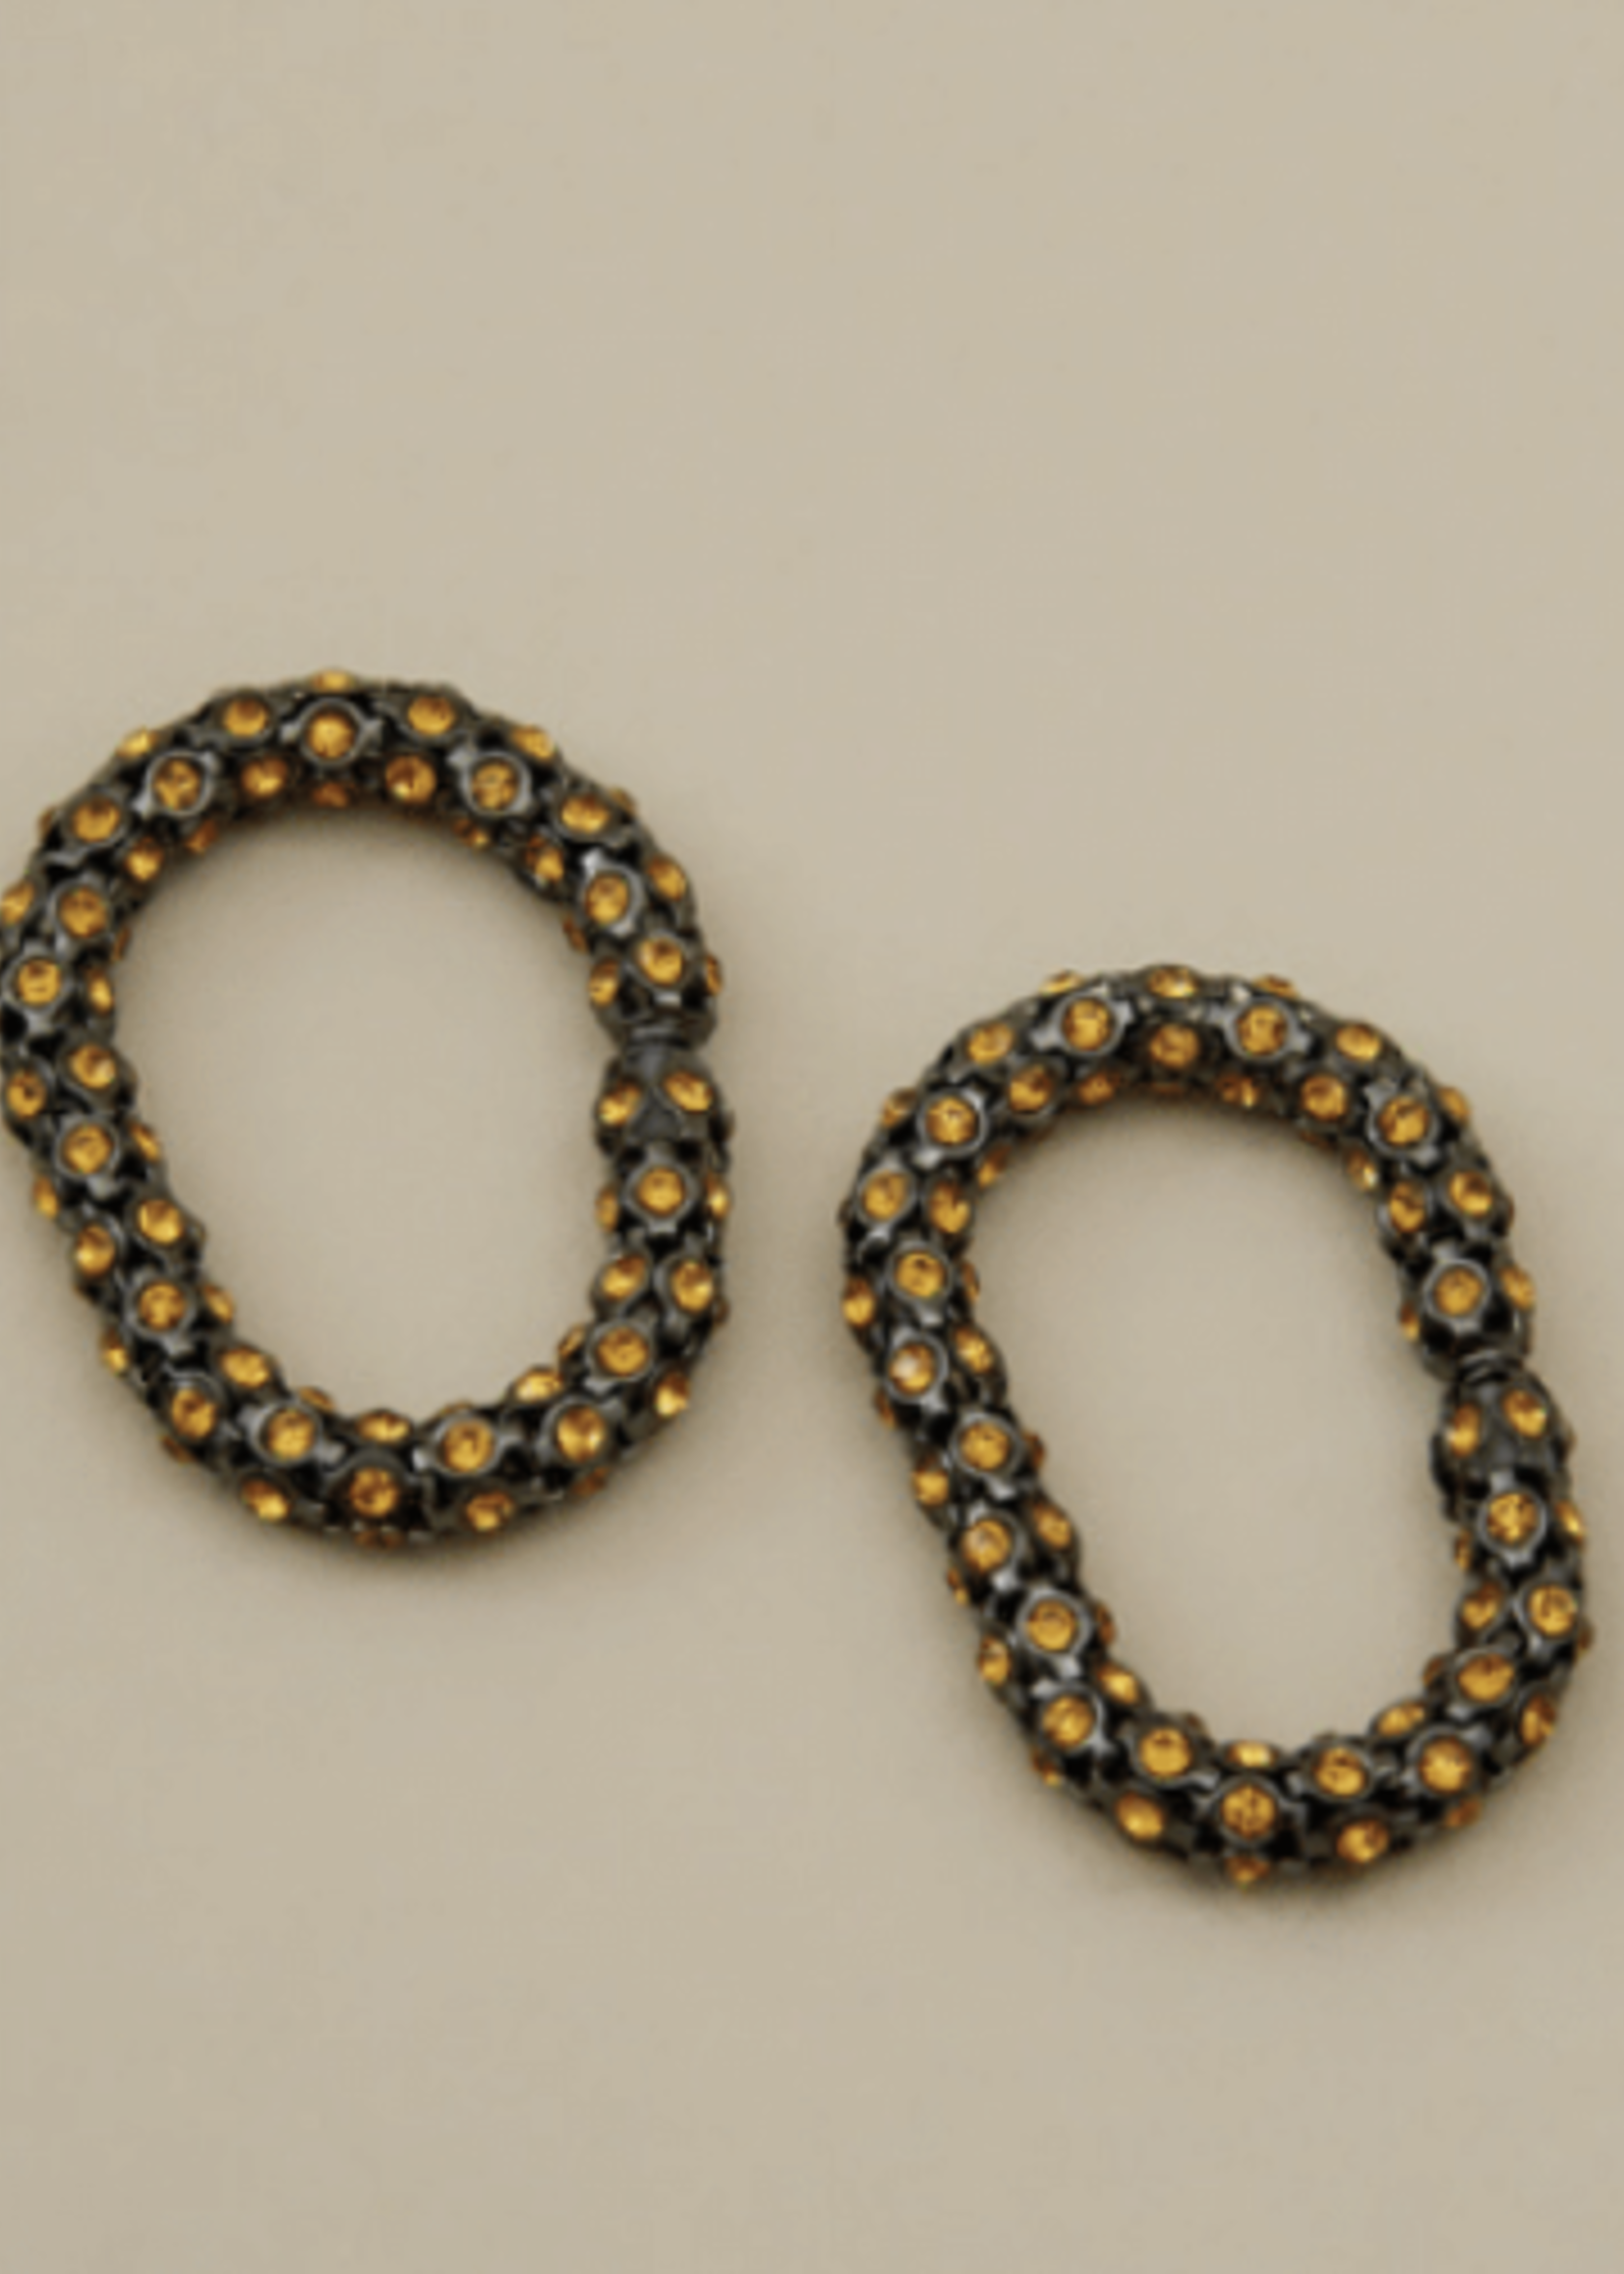 Rachel Comey Purr Earring in Topaz-Hematite